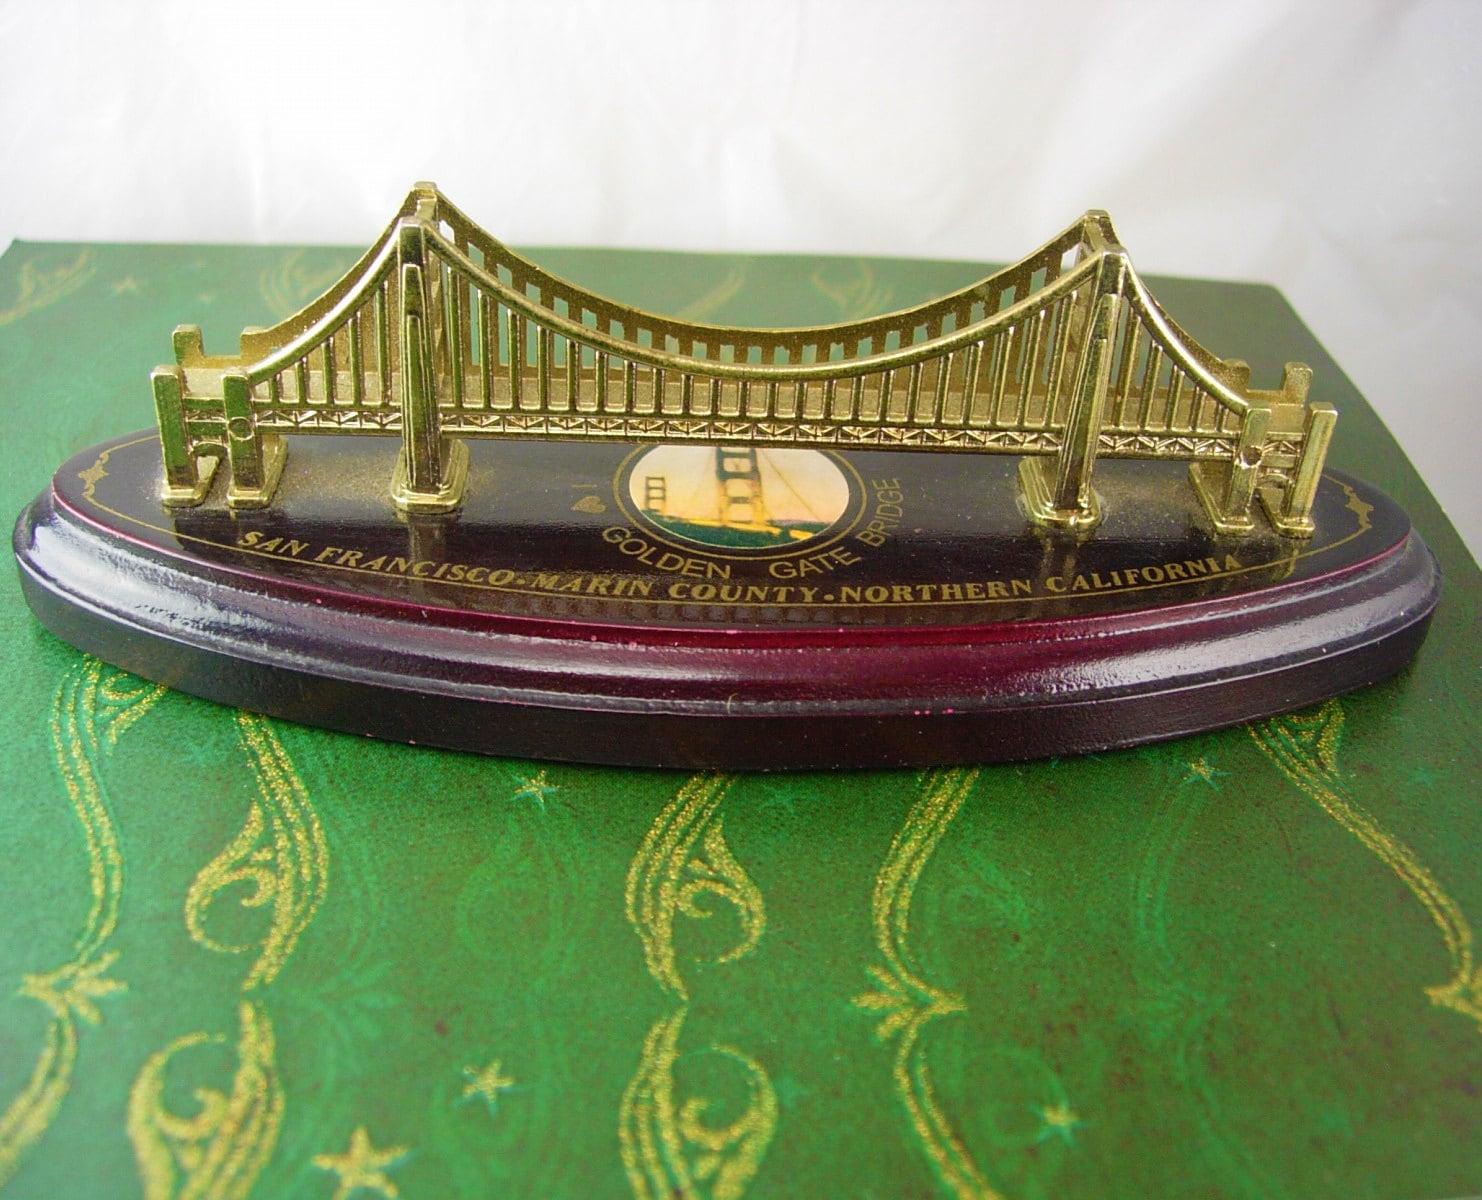 Vintage golden gate bridge souvenir wood metal san francisco for Golden gate bridge jewelry